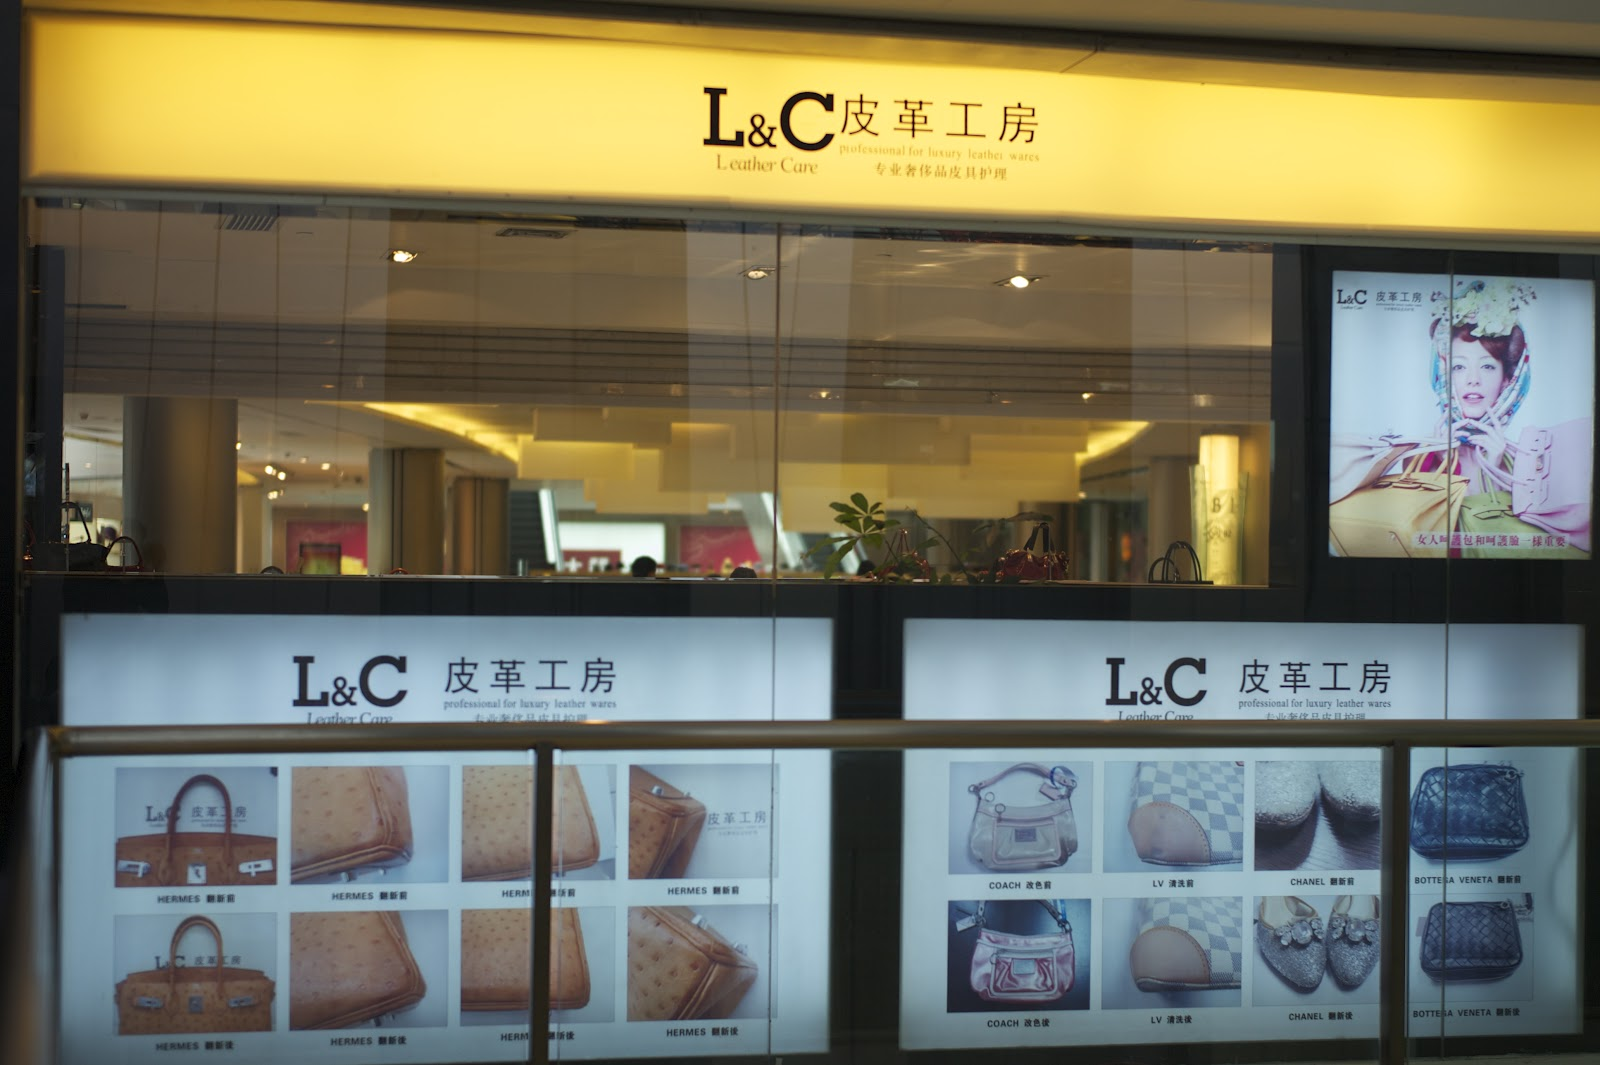 hermes for sale  - L&C Leather Care - ������ Hermes Birkin - Shenzhen | GlobalGoodFood